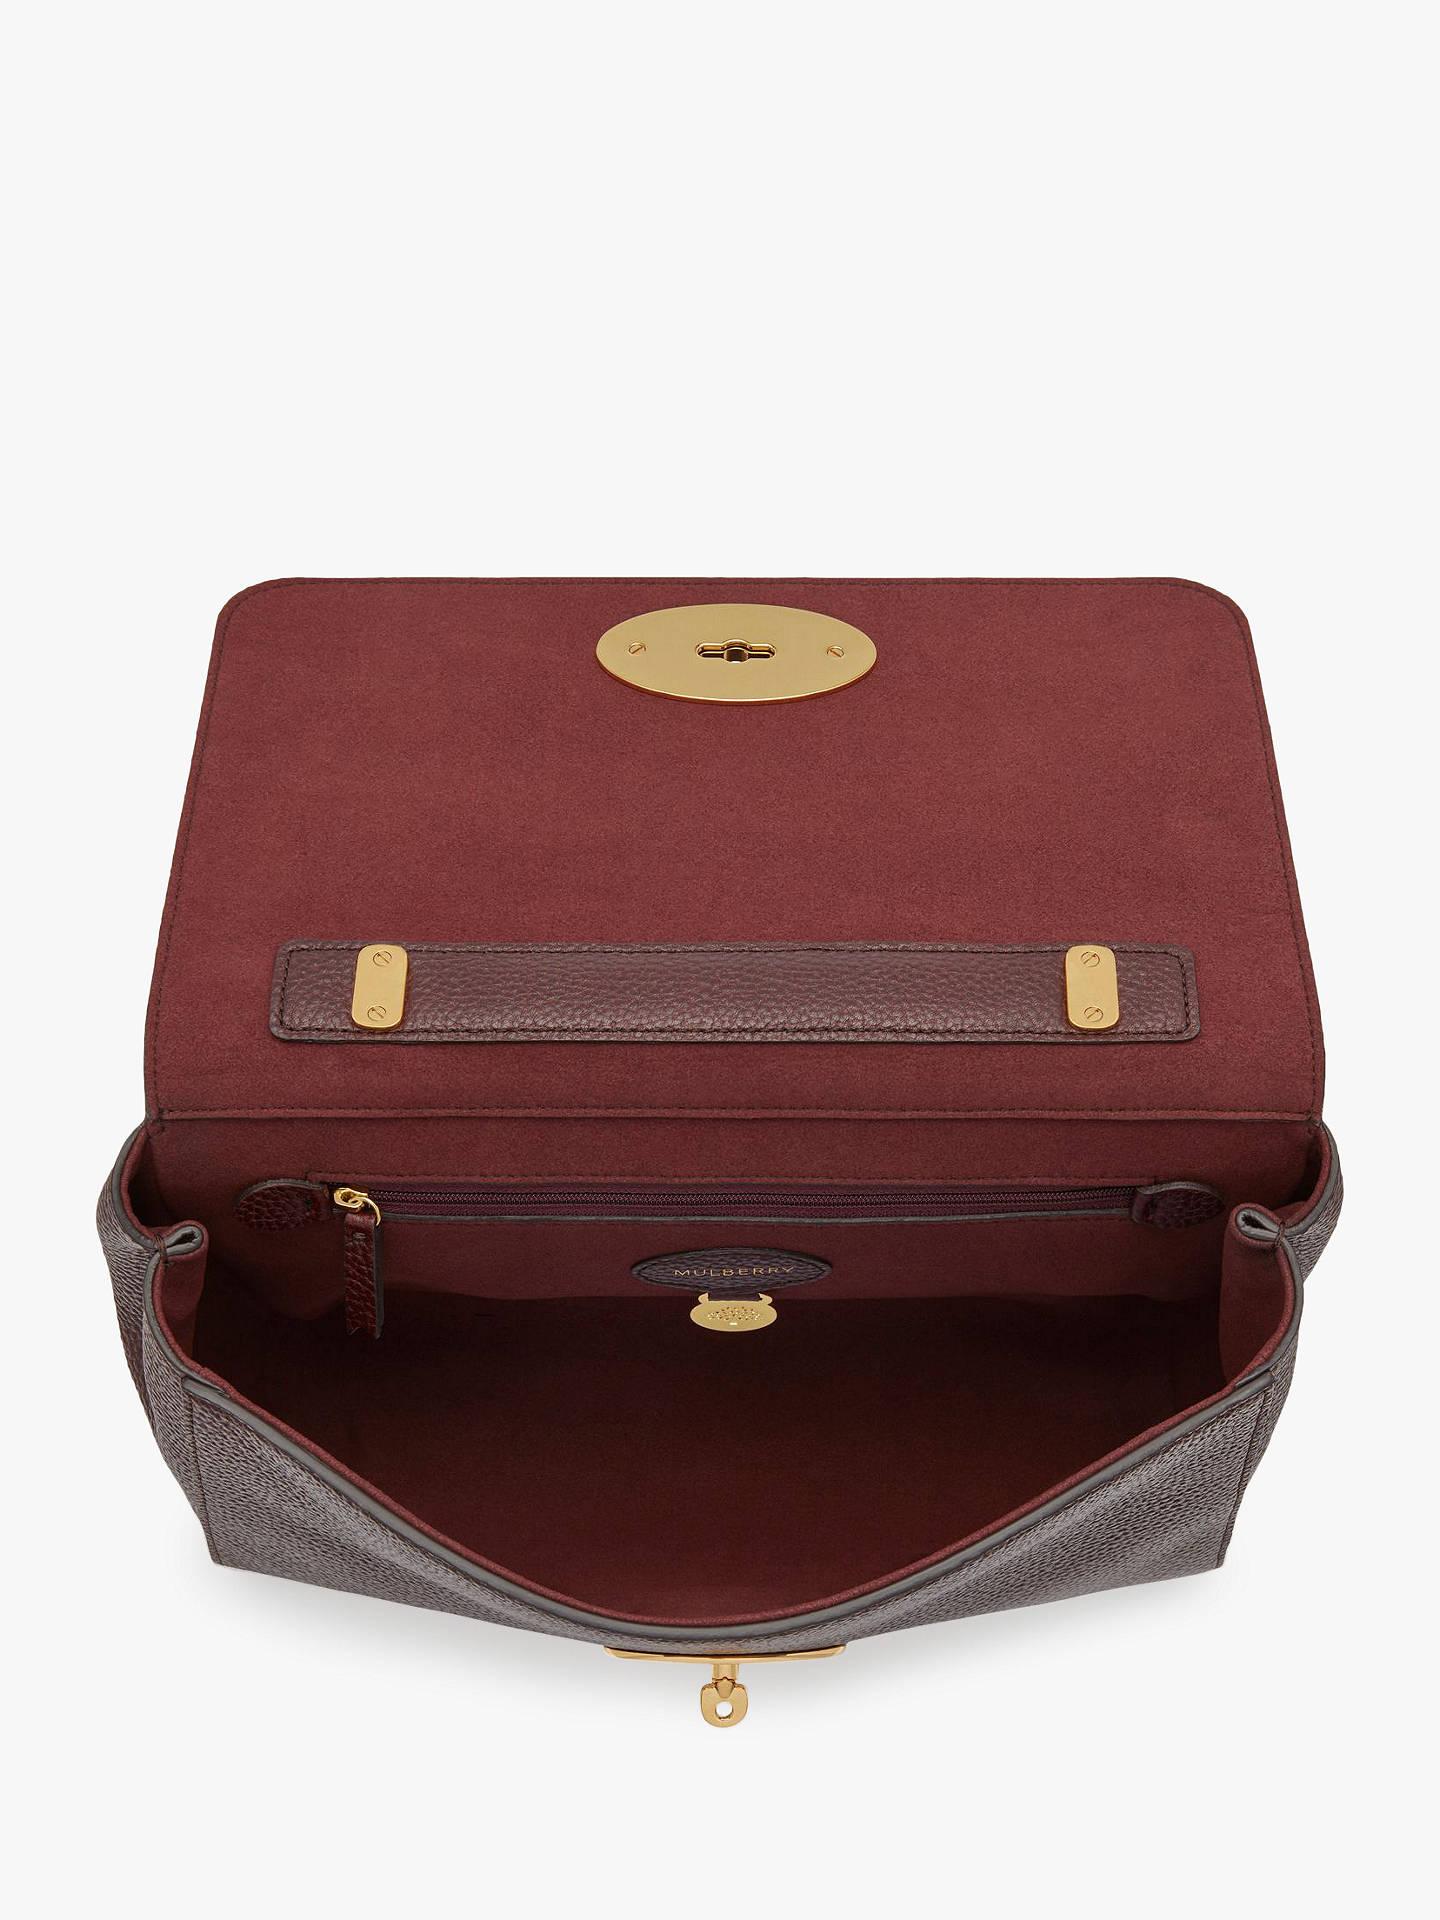 970e58f801cd Mulberry Medium Lily Grain Veg Tanned Leather Shoulder Bag at John ...